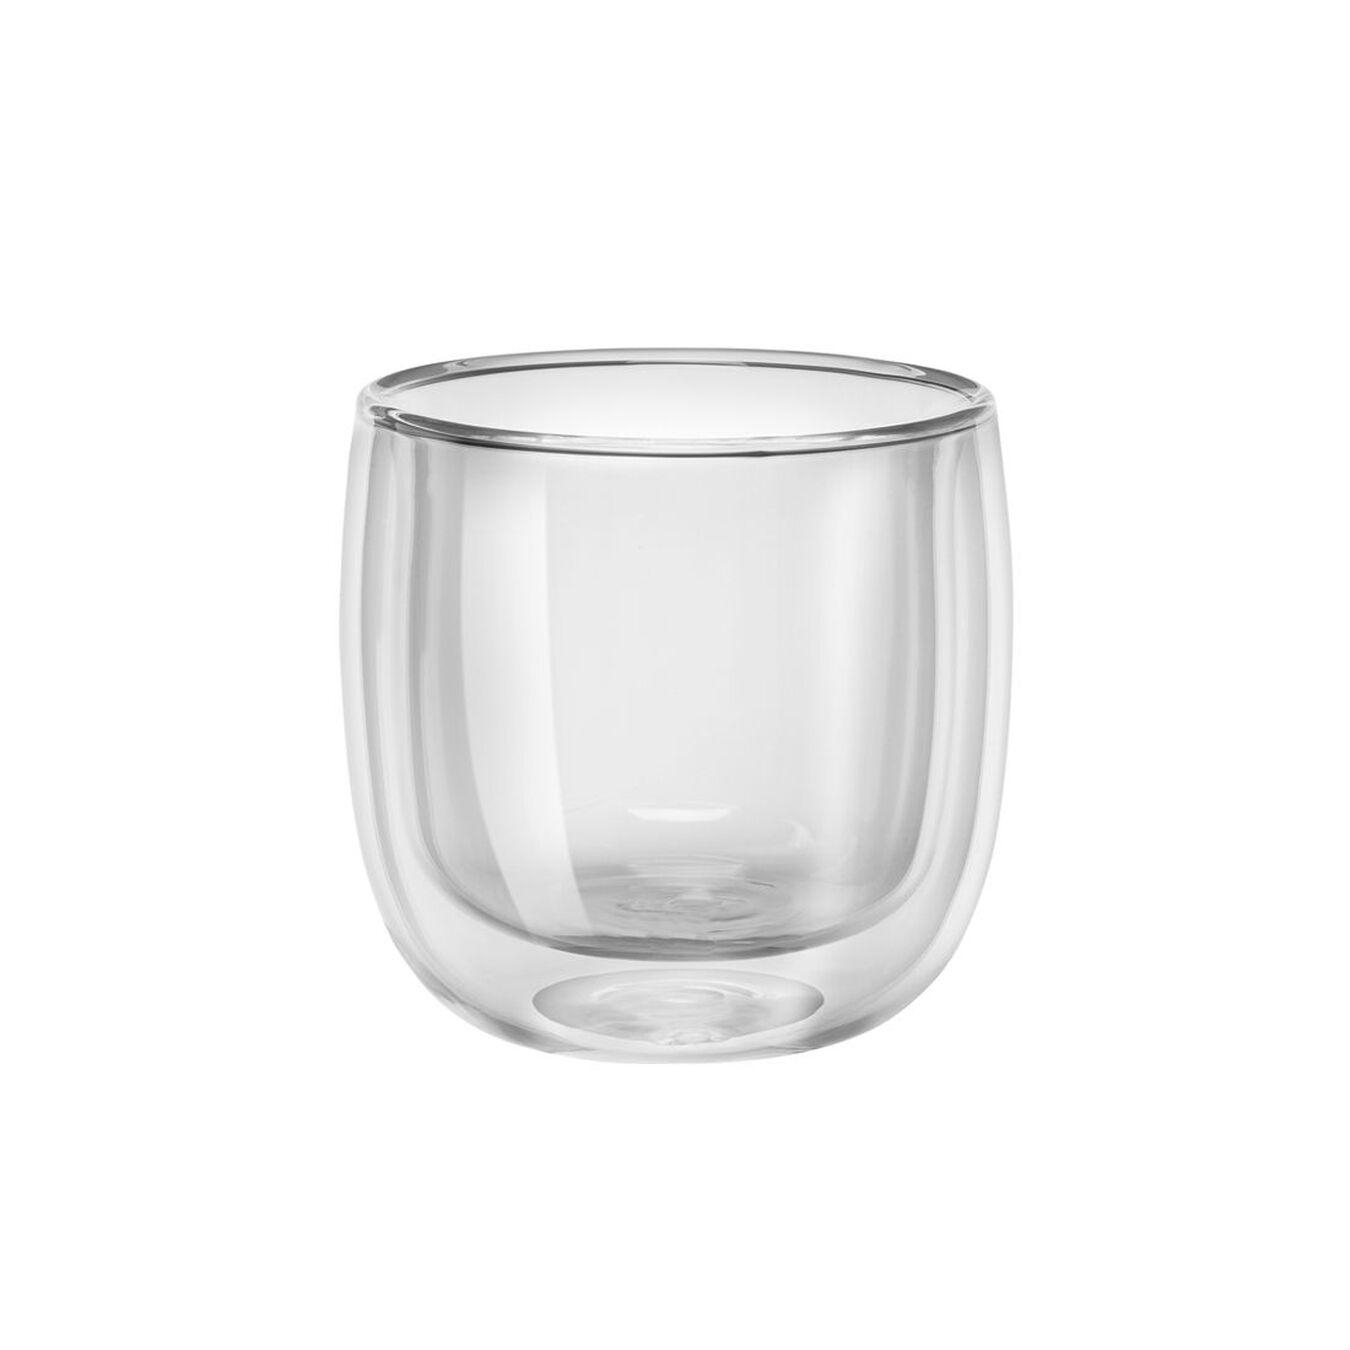 2-pc Tea glass set, Double wall glas ,,large 2